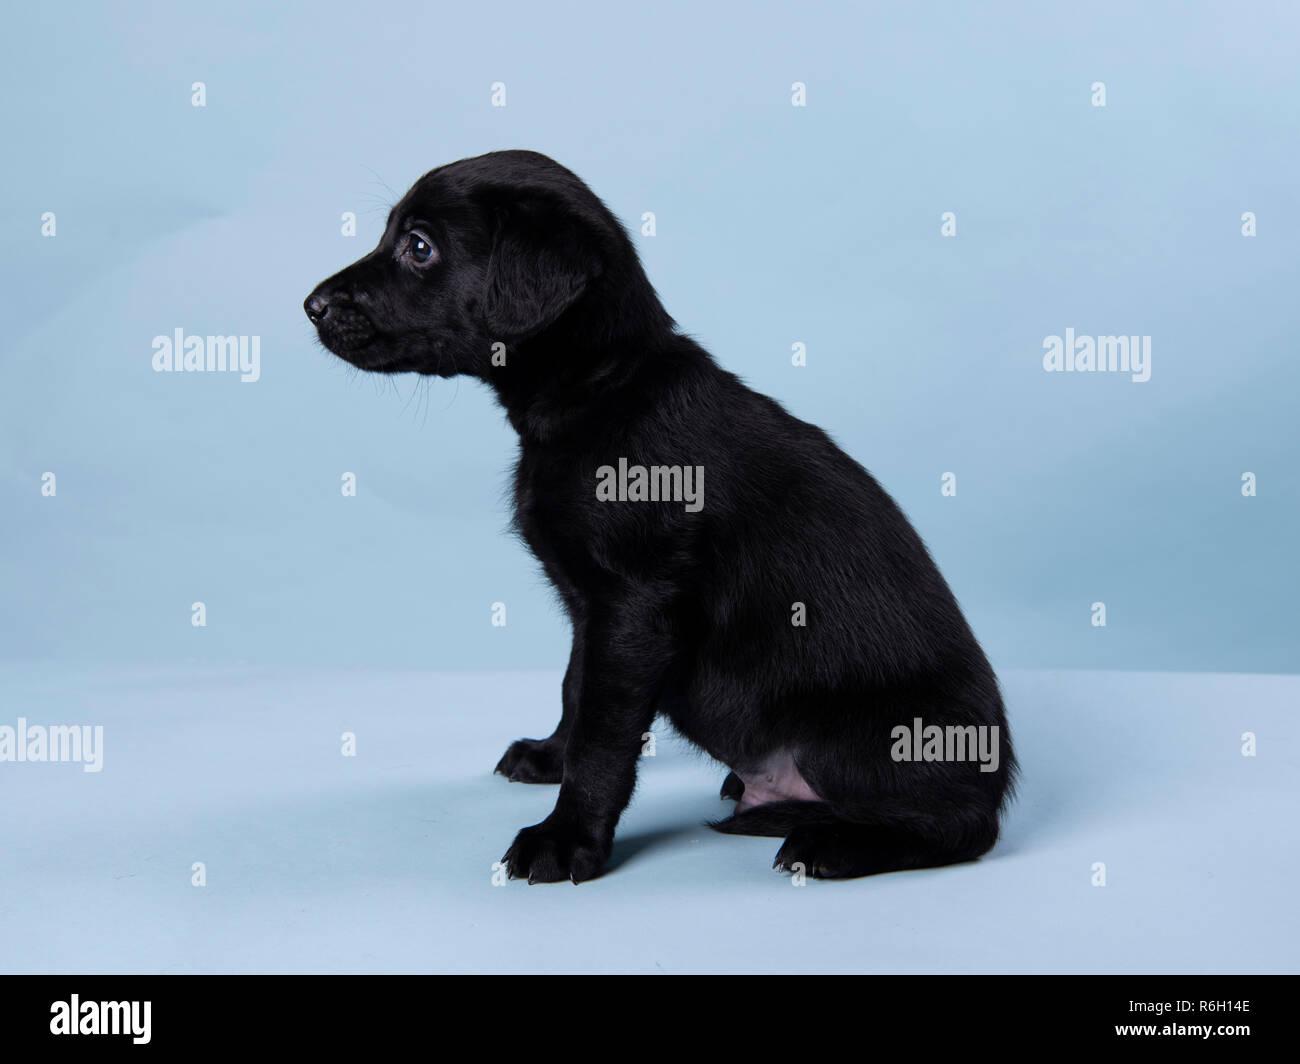 6 Week Old Black Labrador Puppy Stock Photo Alamy